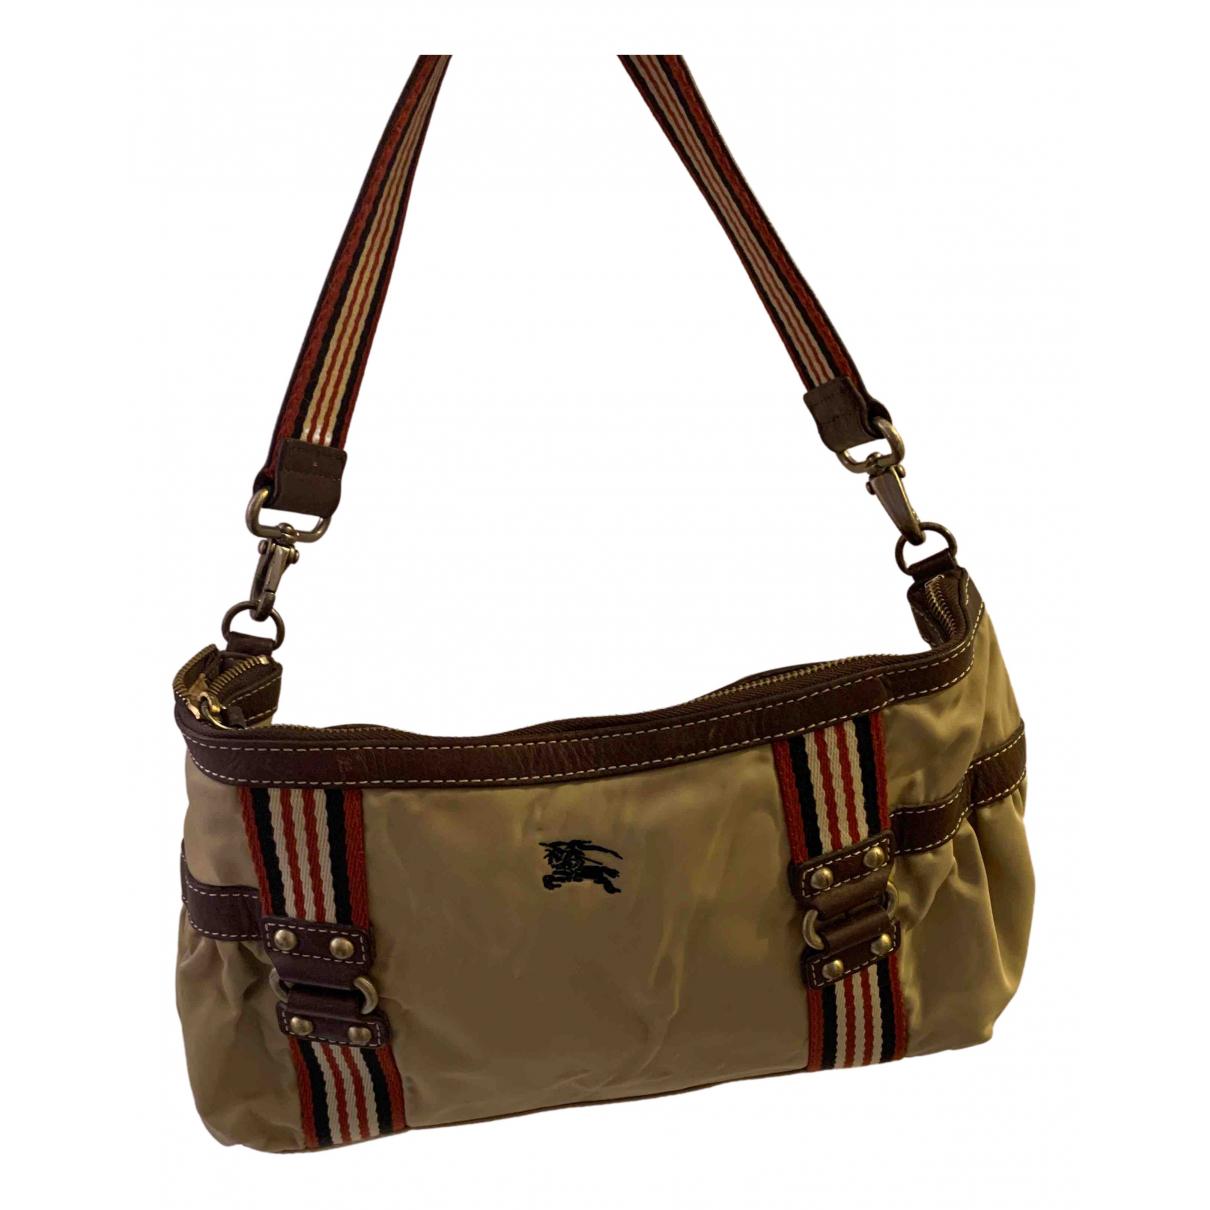 Burberry N Khaki Cloth handbag for Women N